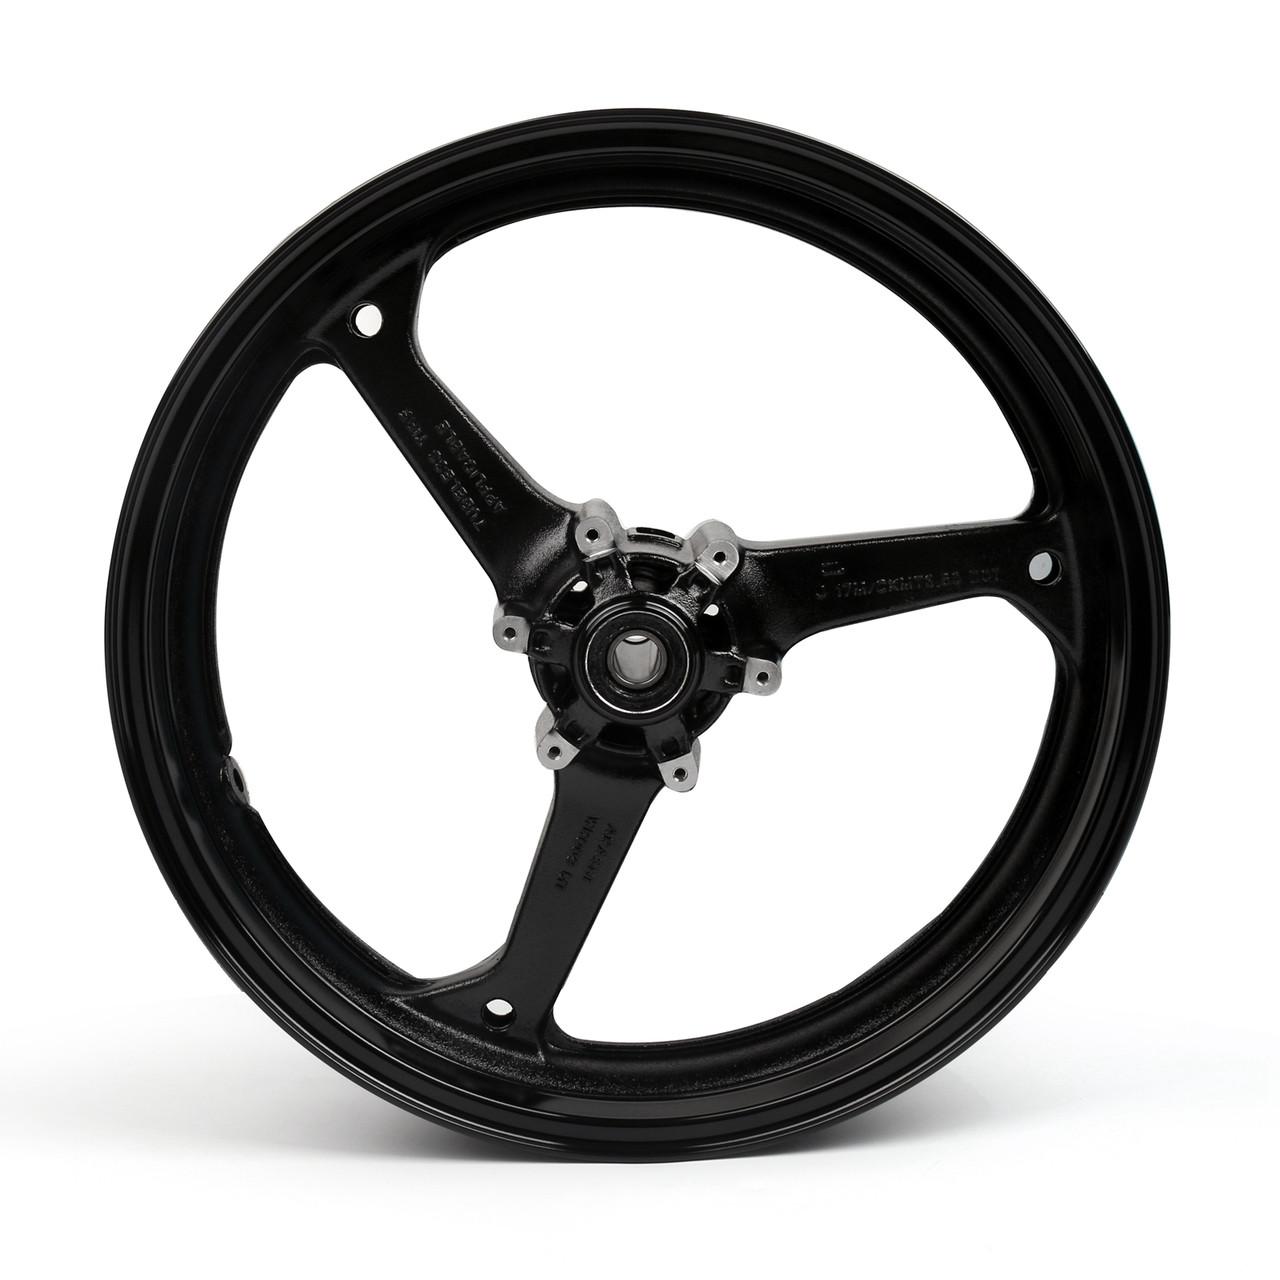 http://www.madhornets.store/AMZ/MotoPart/Wheel/M514-A004/M514-A004-Front-2.jpg